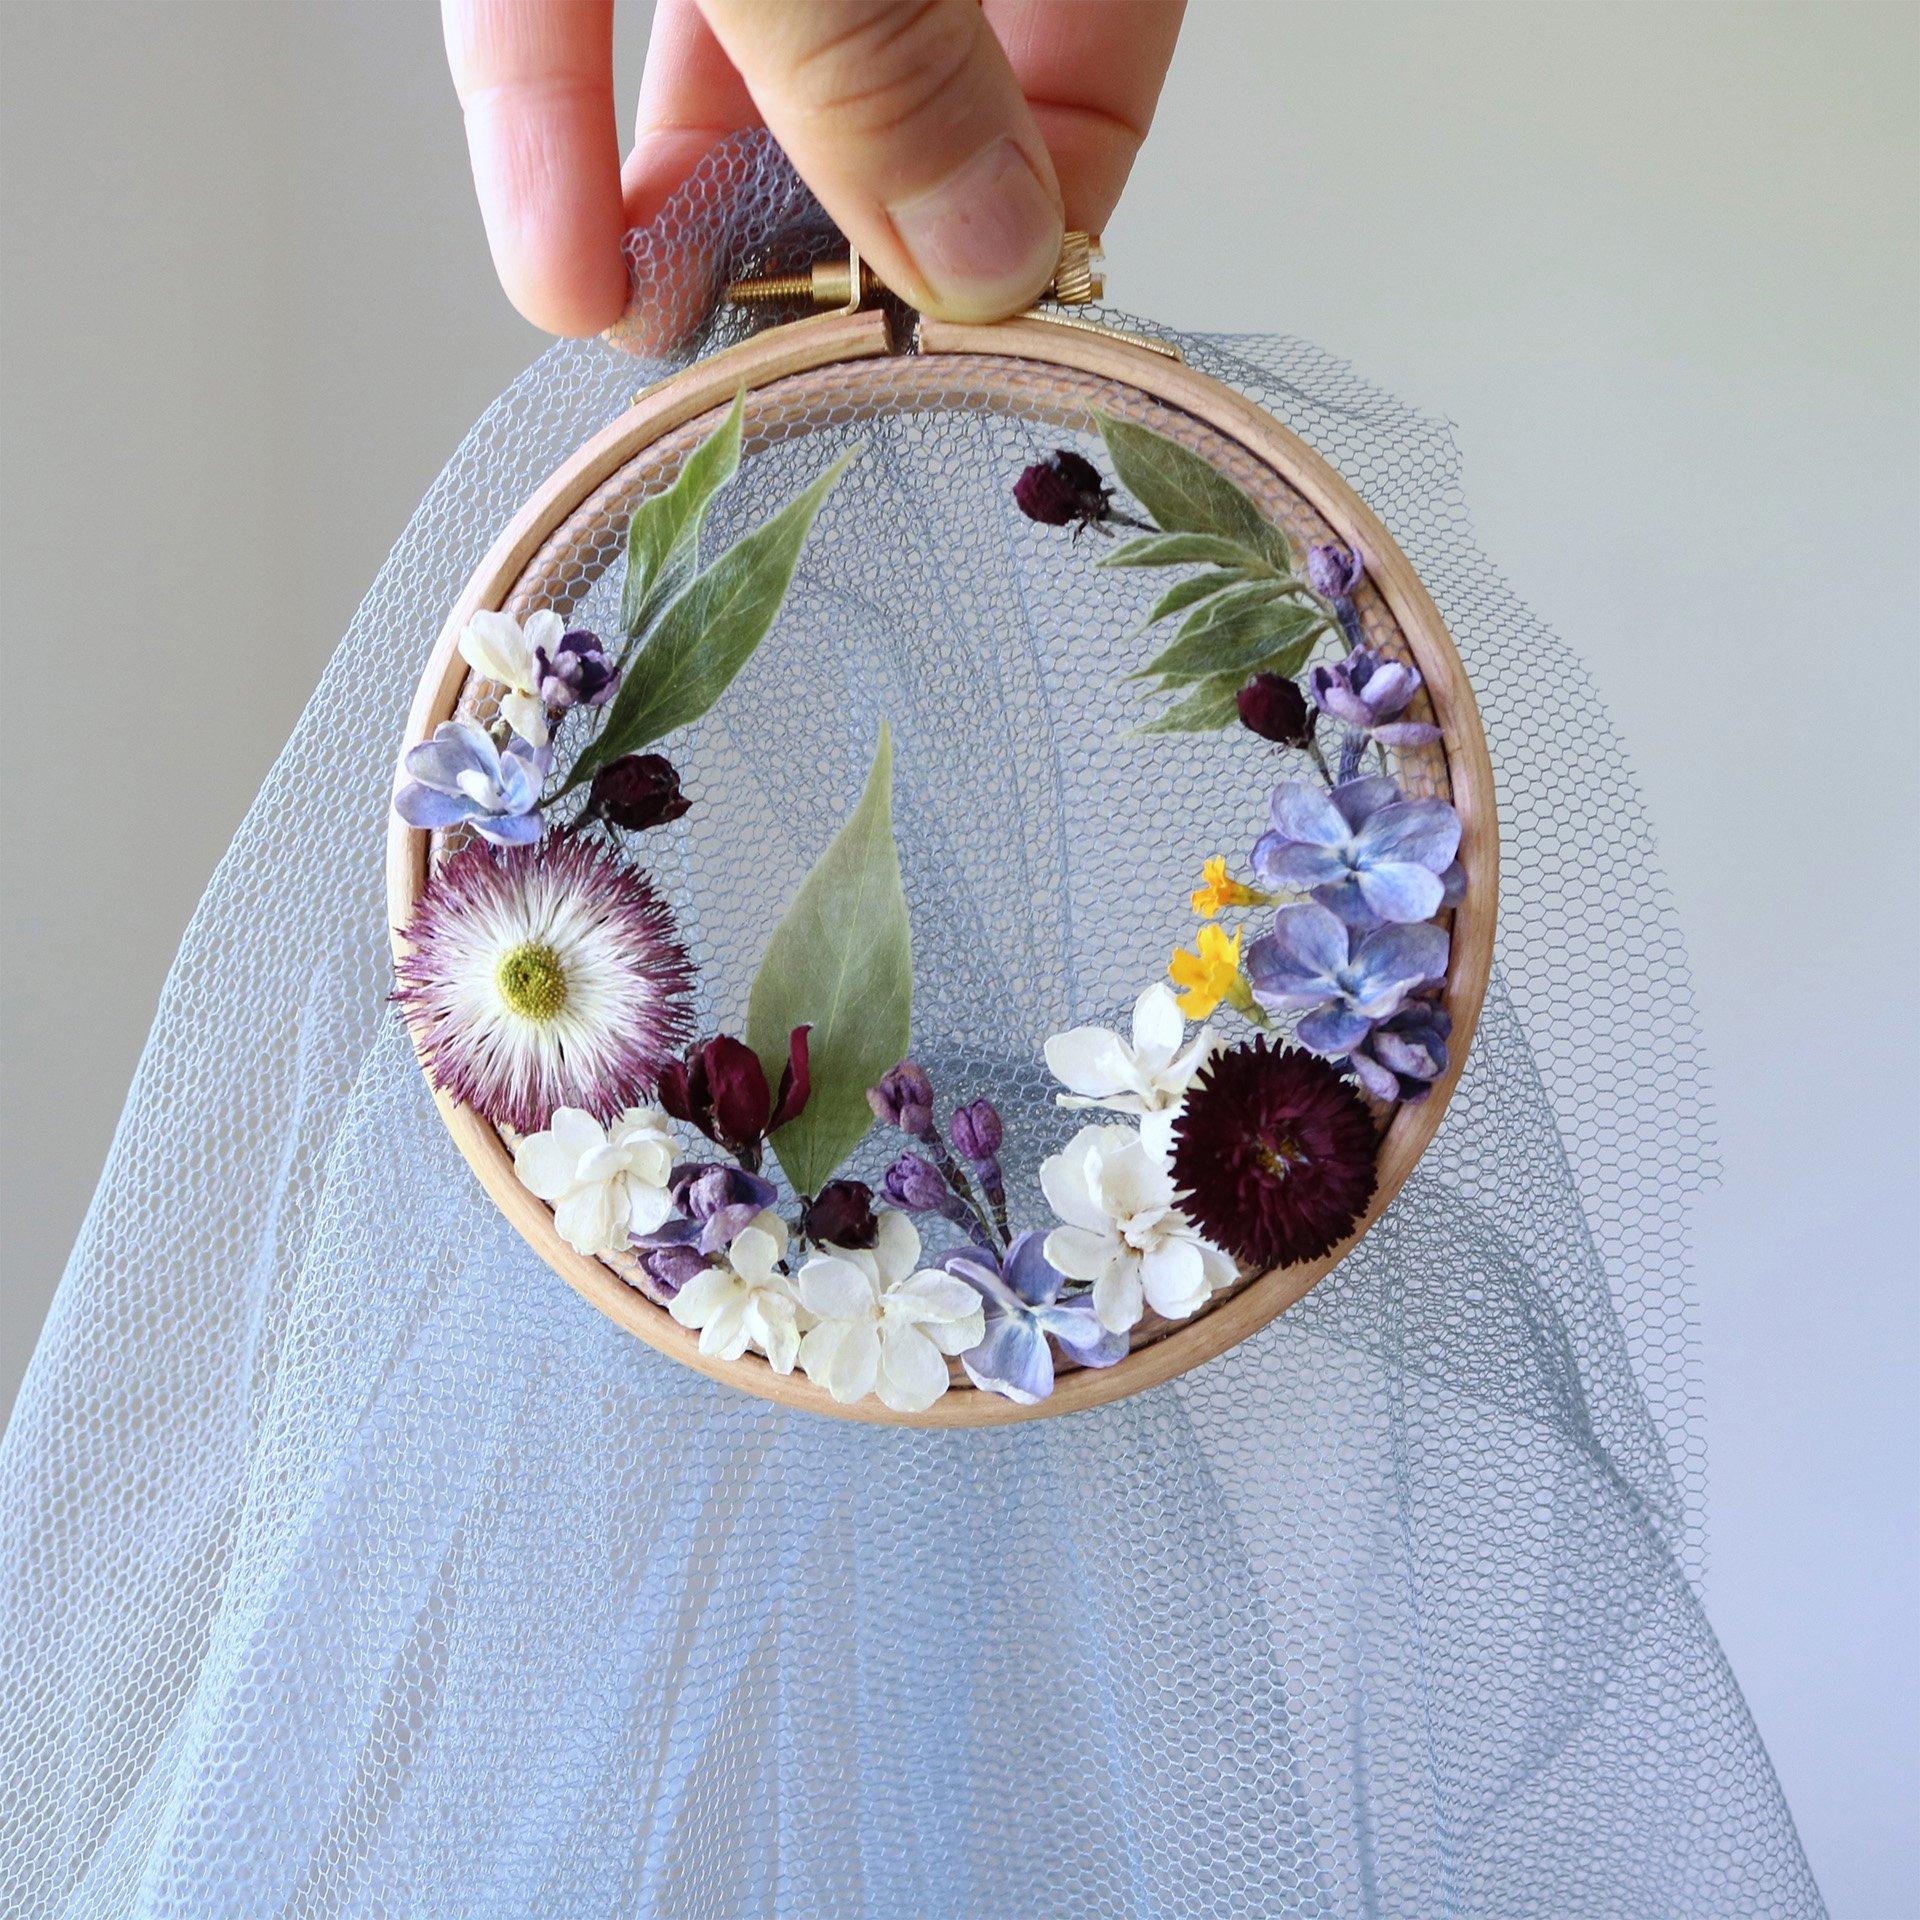 Intervista Olga Prinku, designer ricami in tulle, fiori secchi